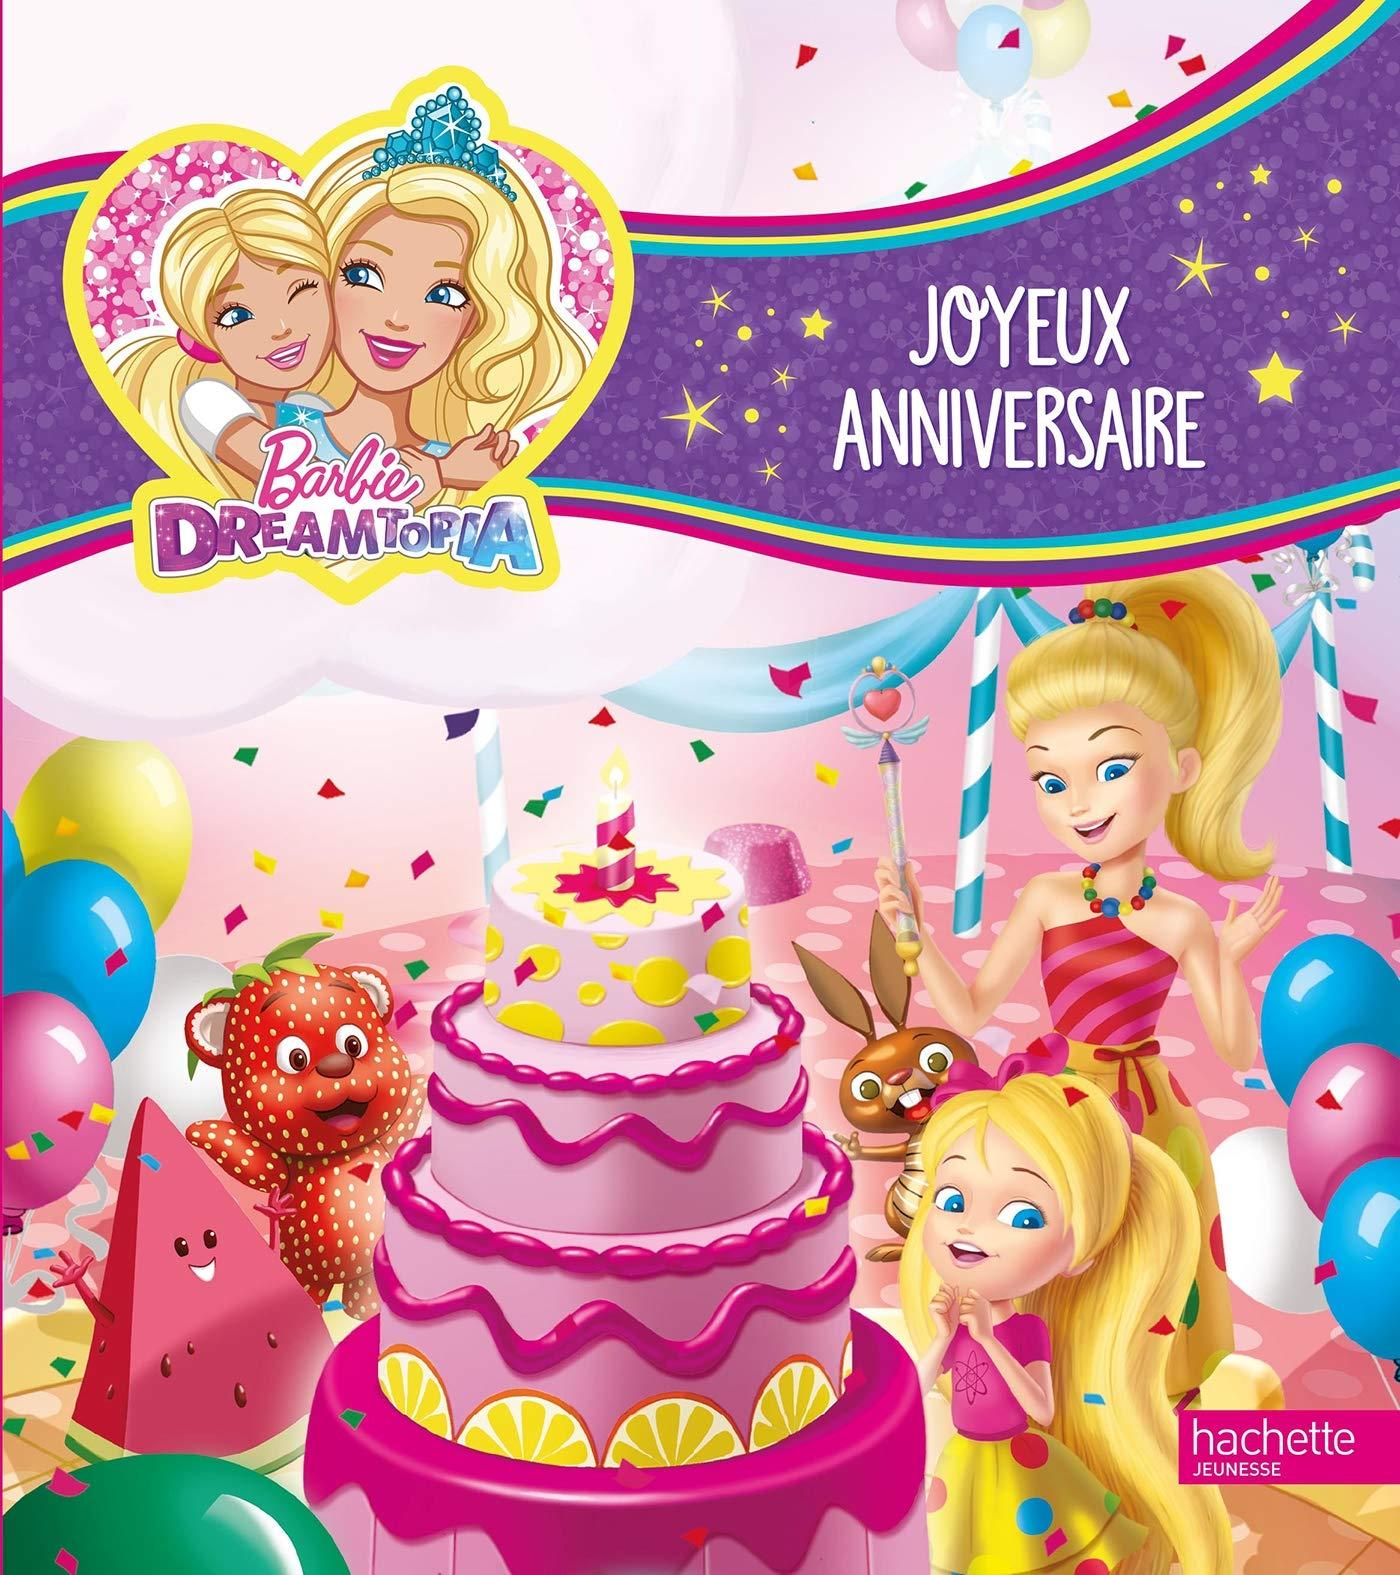 Barbie Dreamtopia Joyeux Anniversaire French Edition 9782017039525 Amazon Com Books